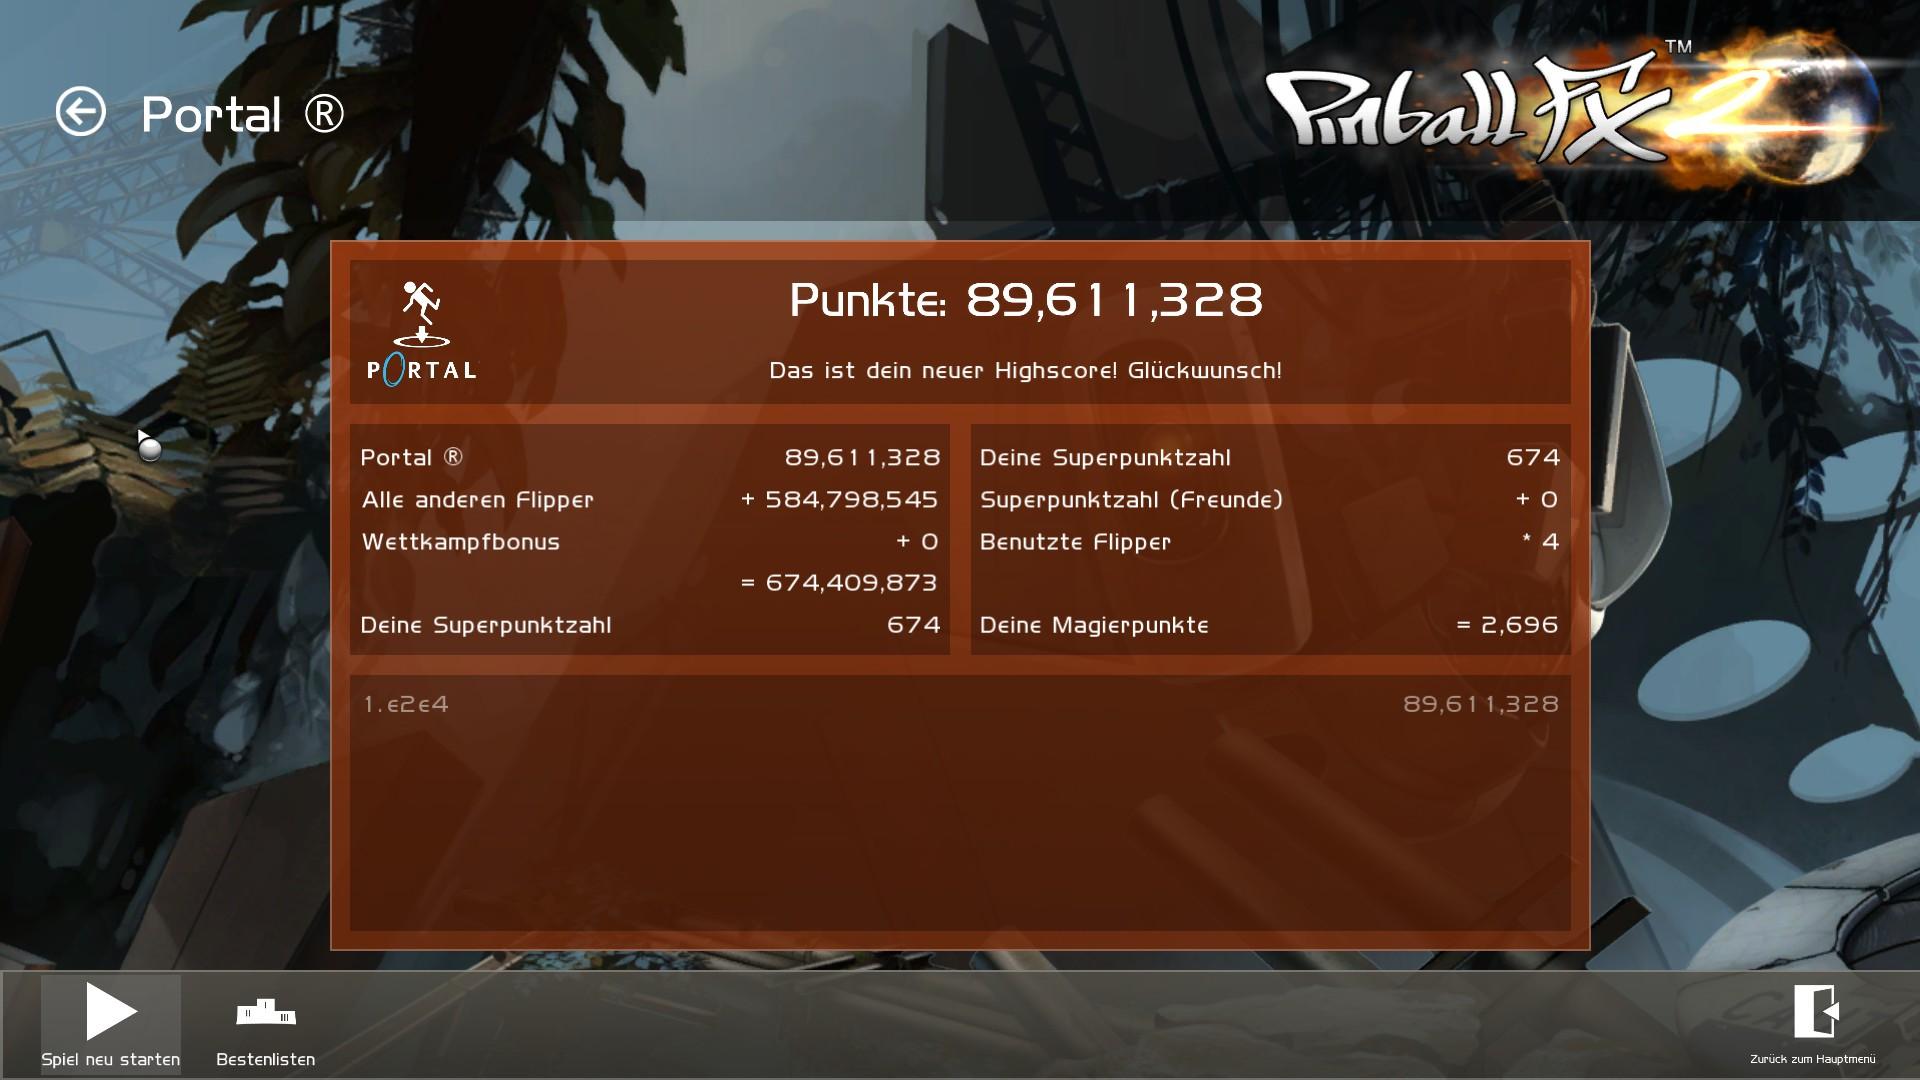 Pinball FX2: Portal® 89,611,328 points